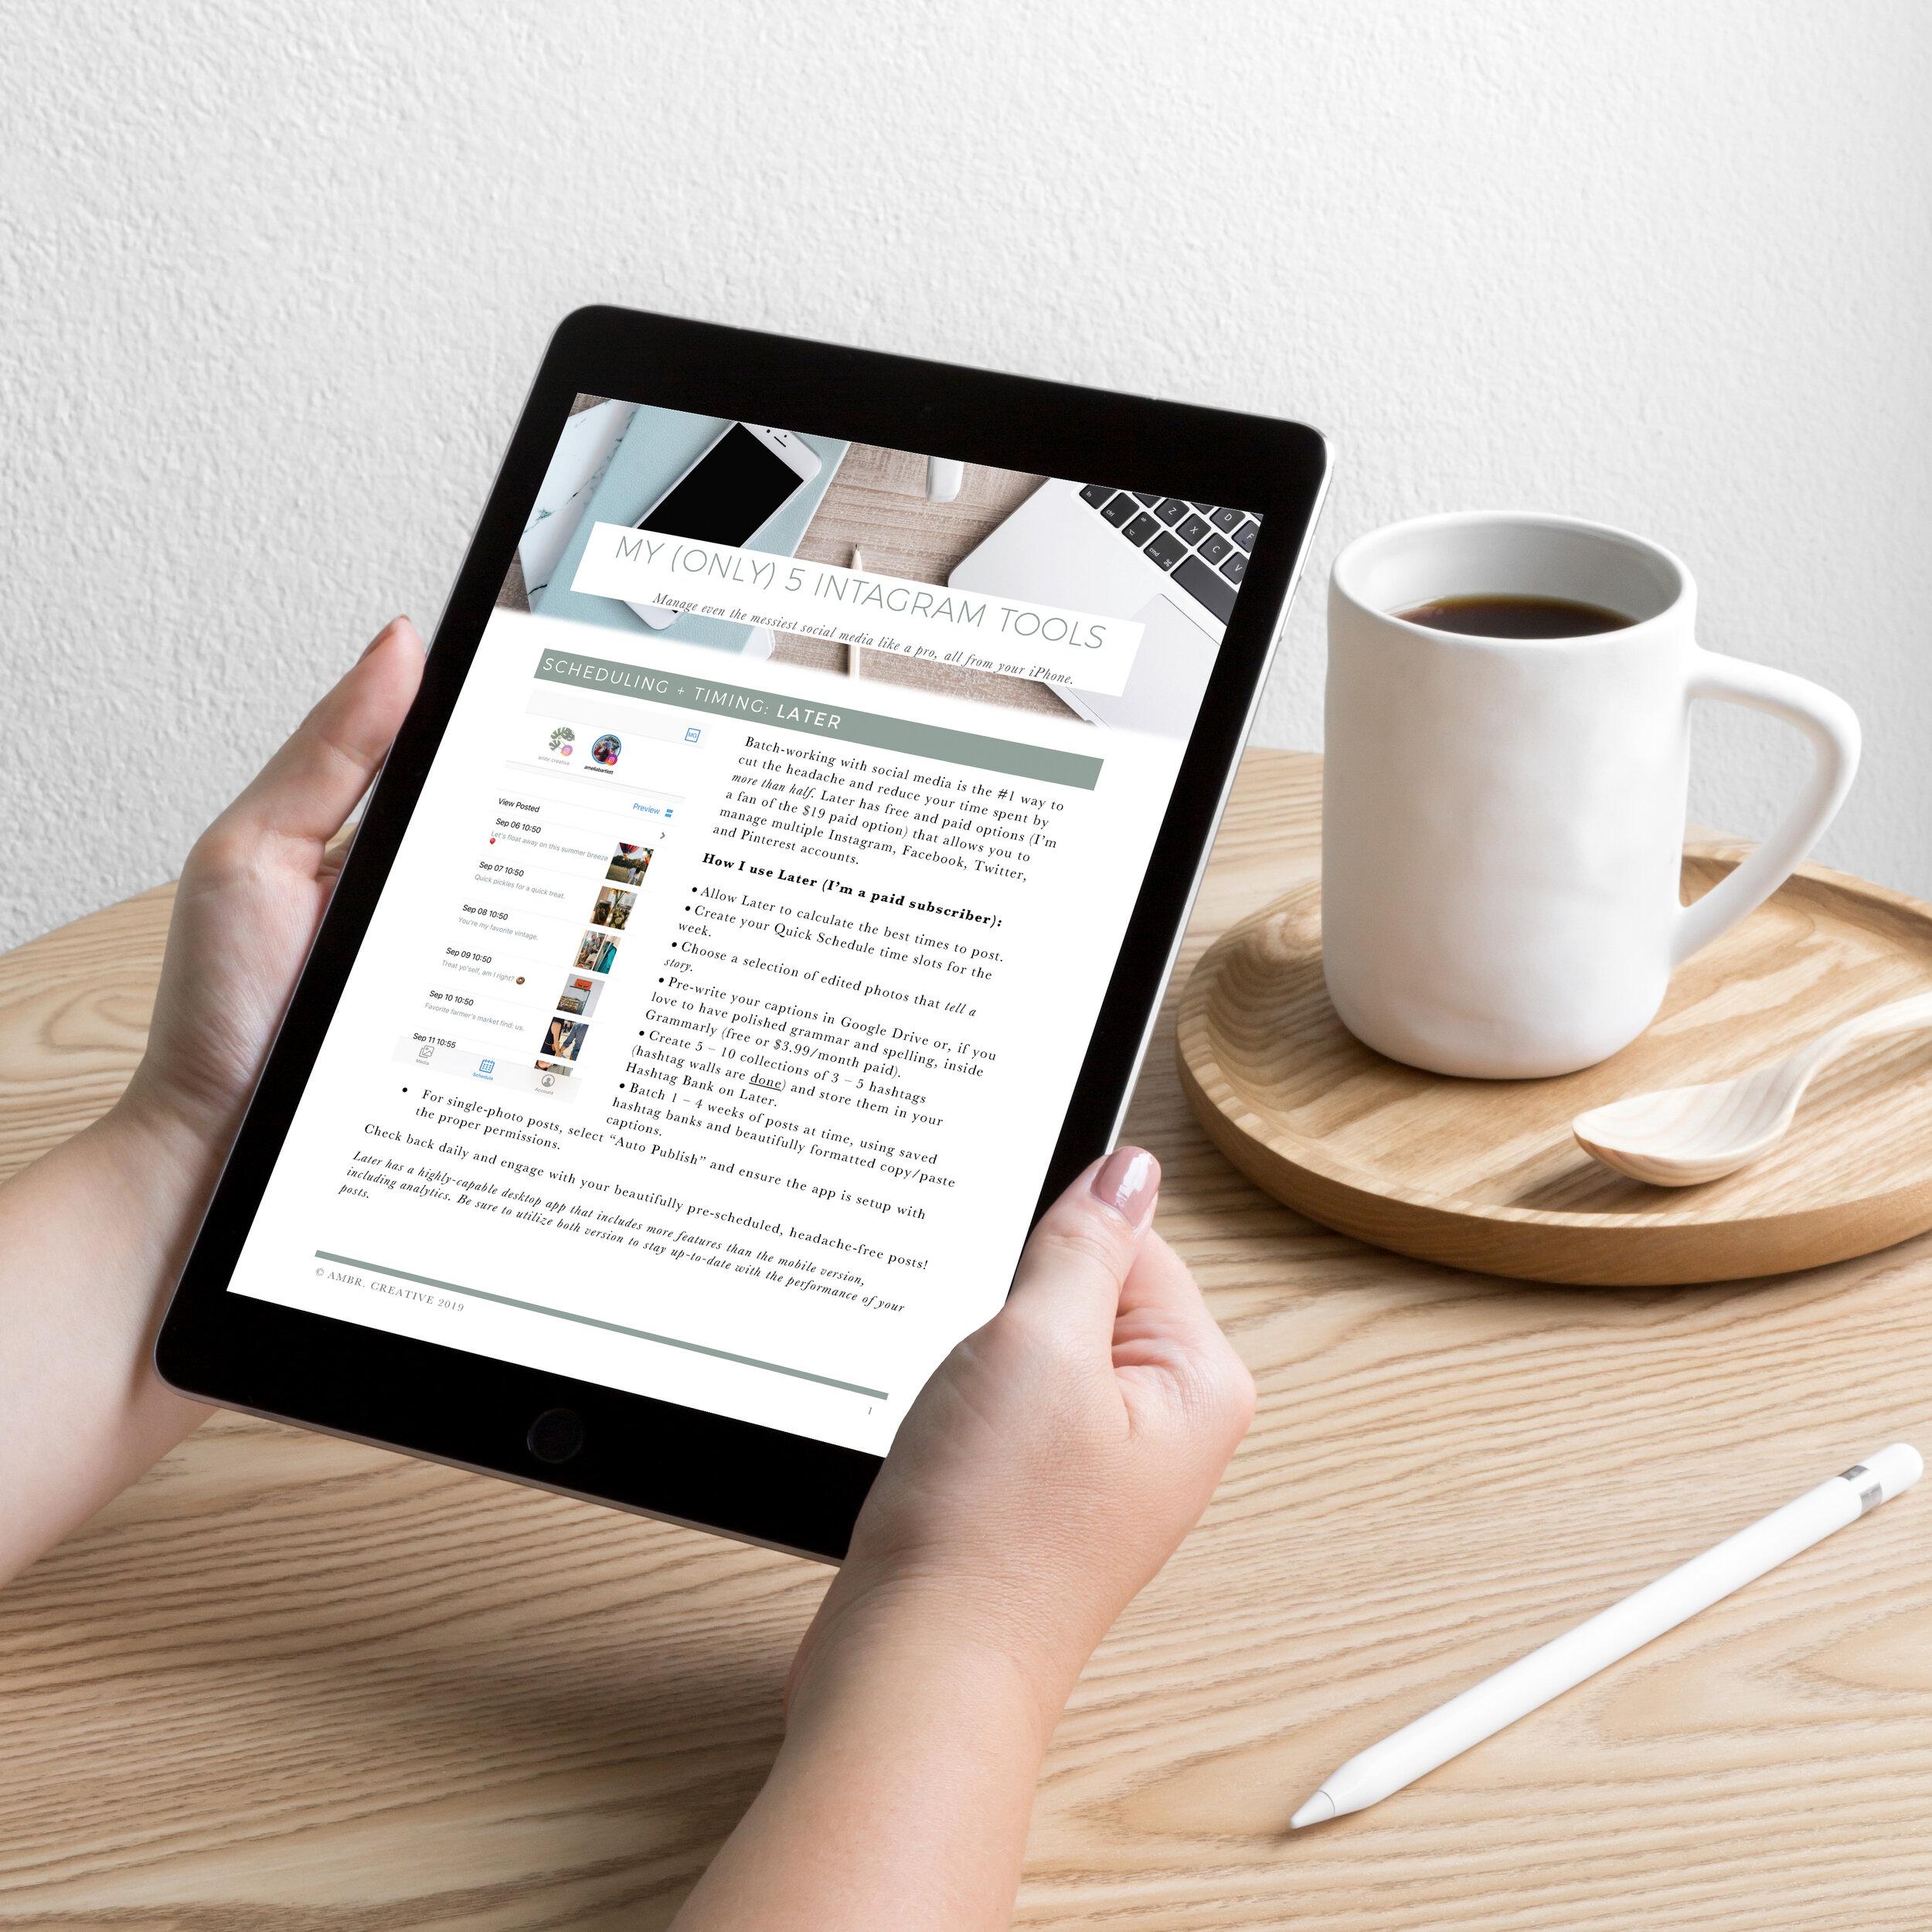 5-instagram-apps-free-guide-ipad-pdf.jpg